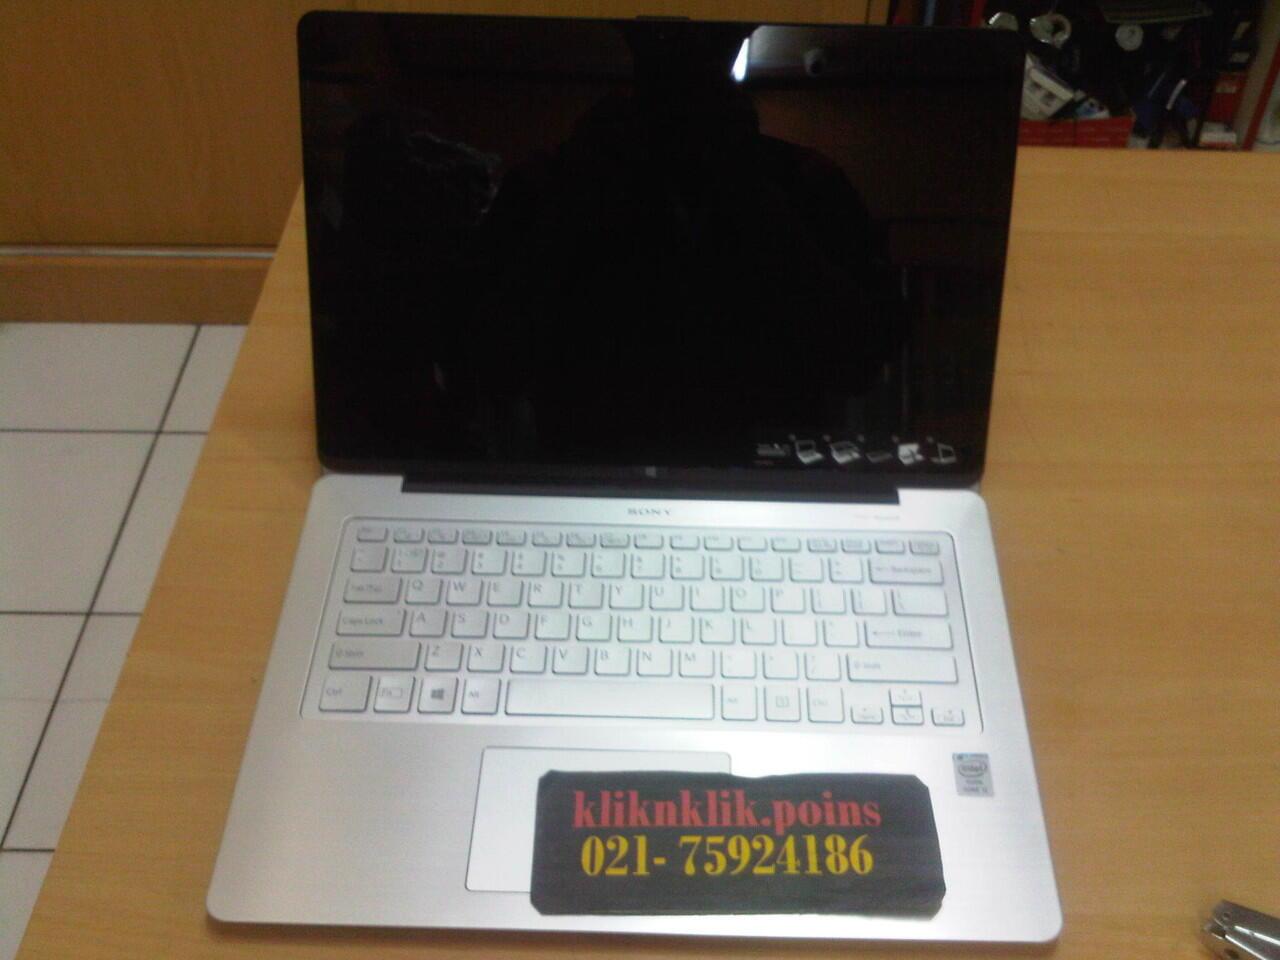 jual laptop SONY Vaio Flip 14 Touch SVF14-N16SGS, Silver kaskus @kliknklik.poins